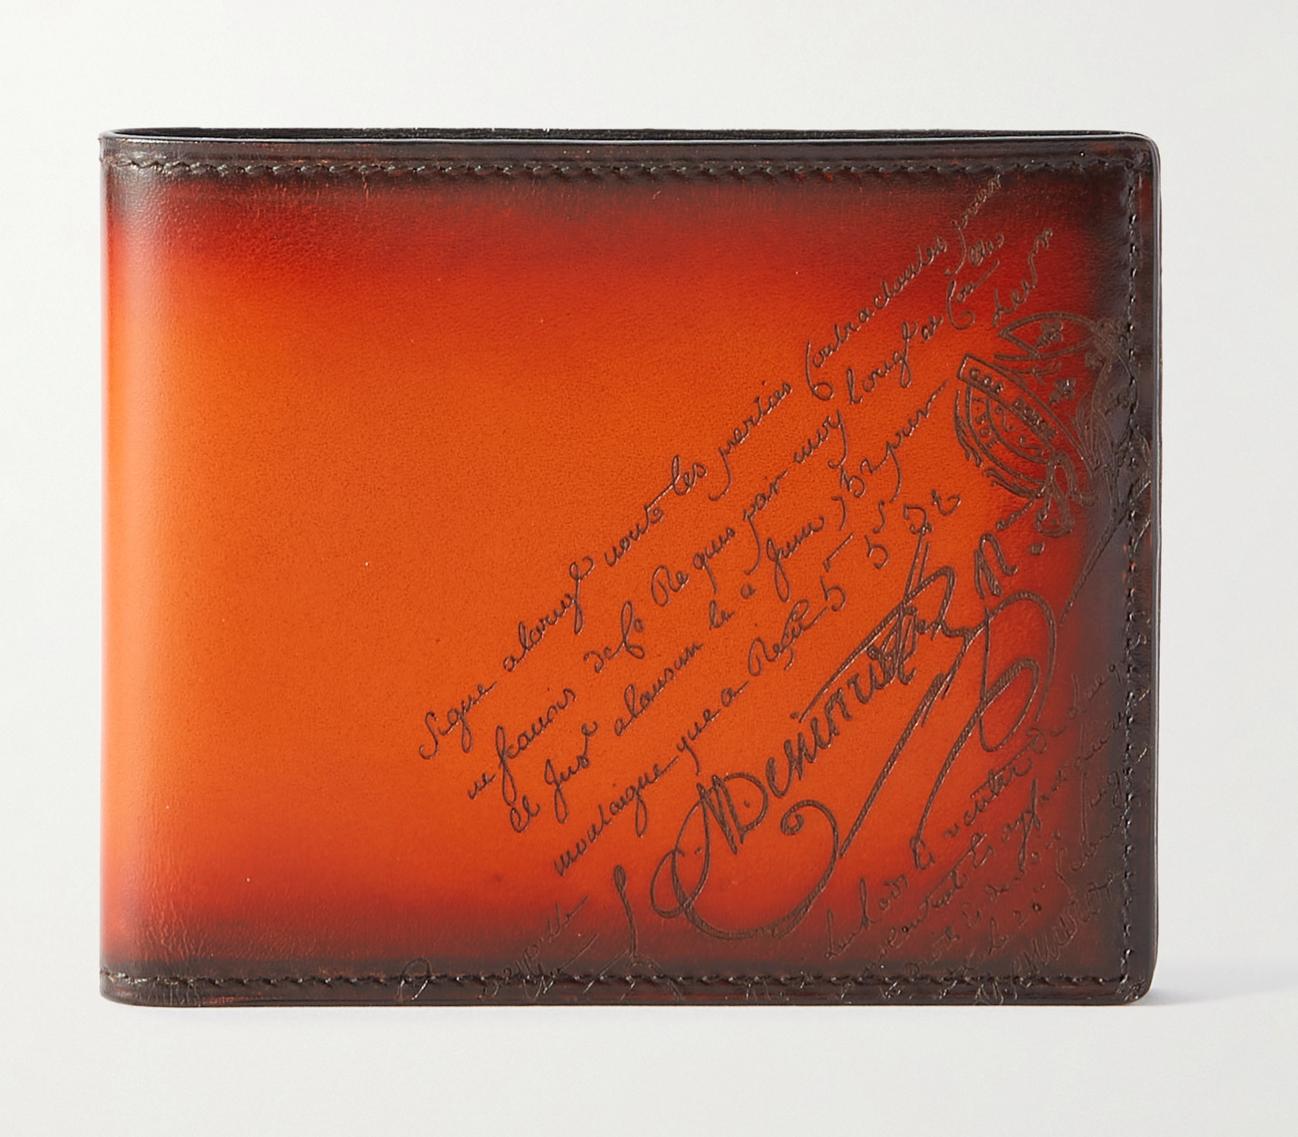 Berluti leather designer wallet for men